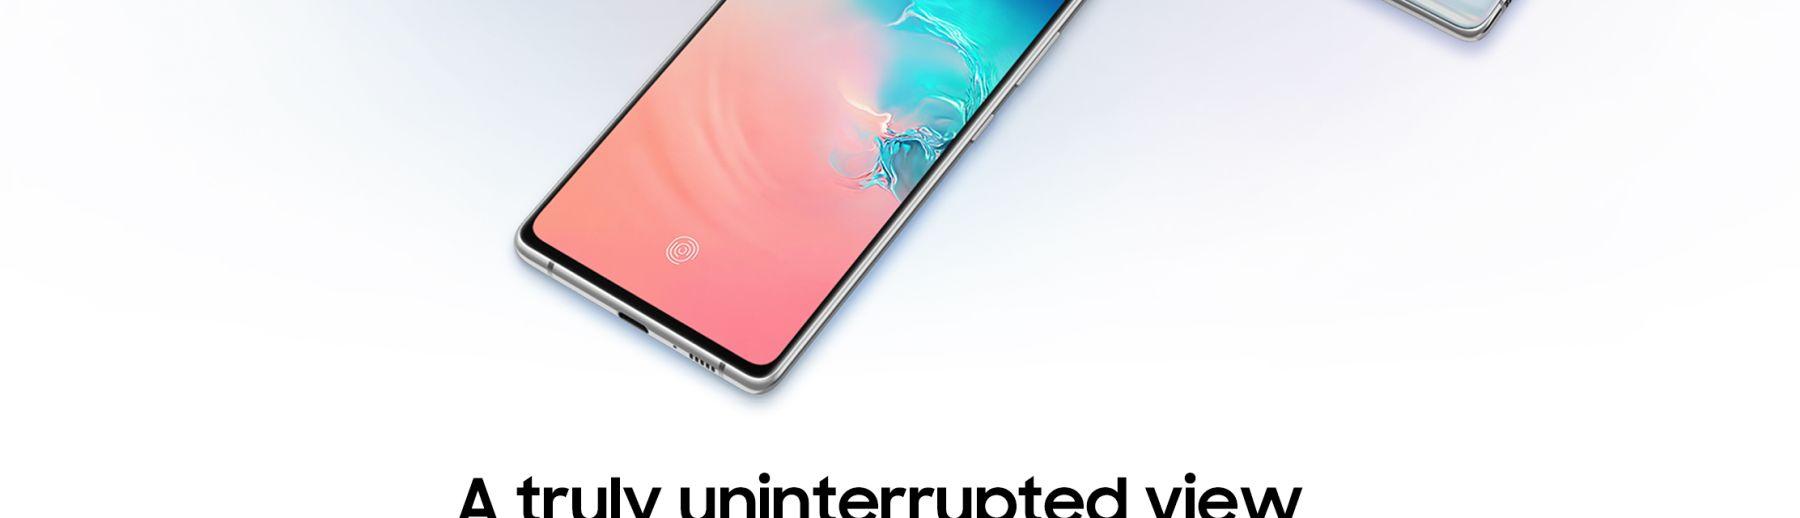 Samsung-S10lite-19-New